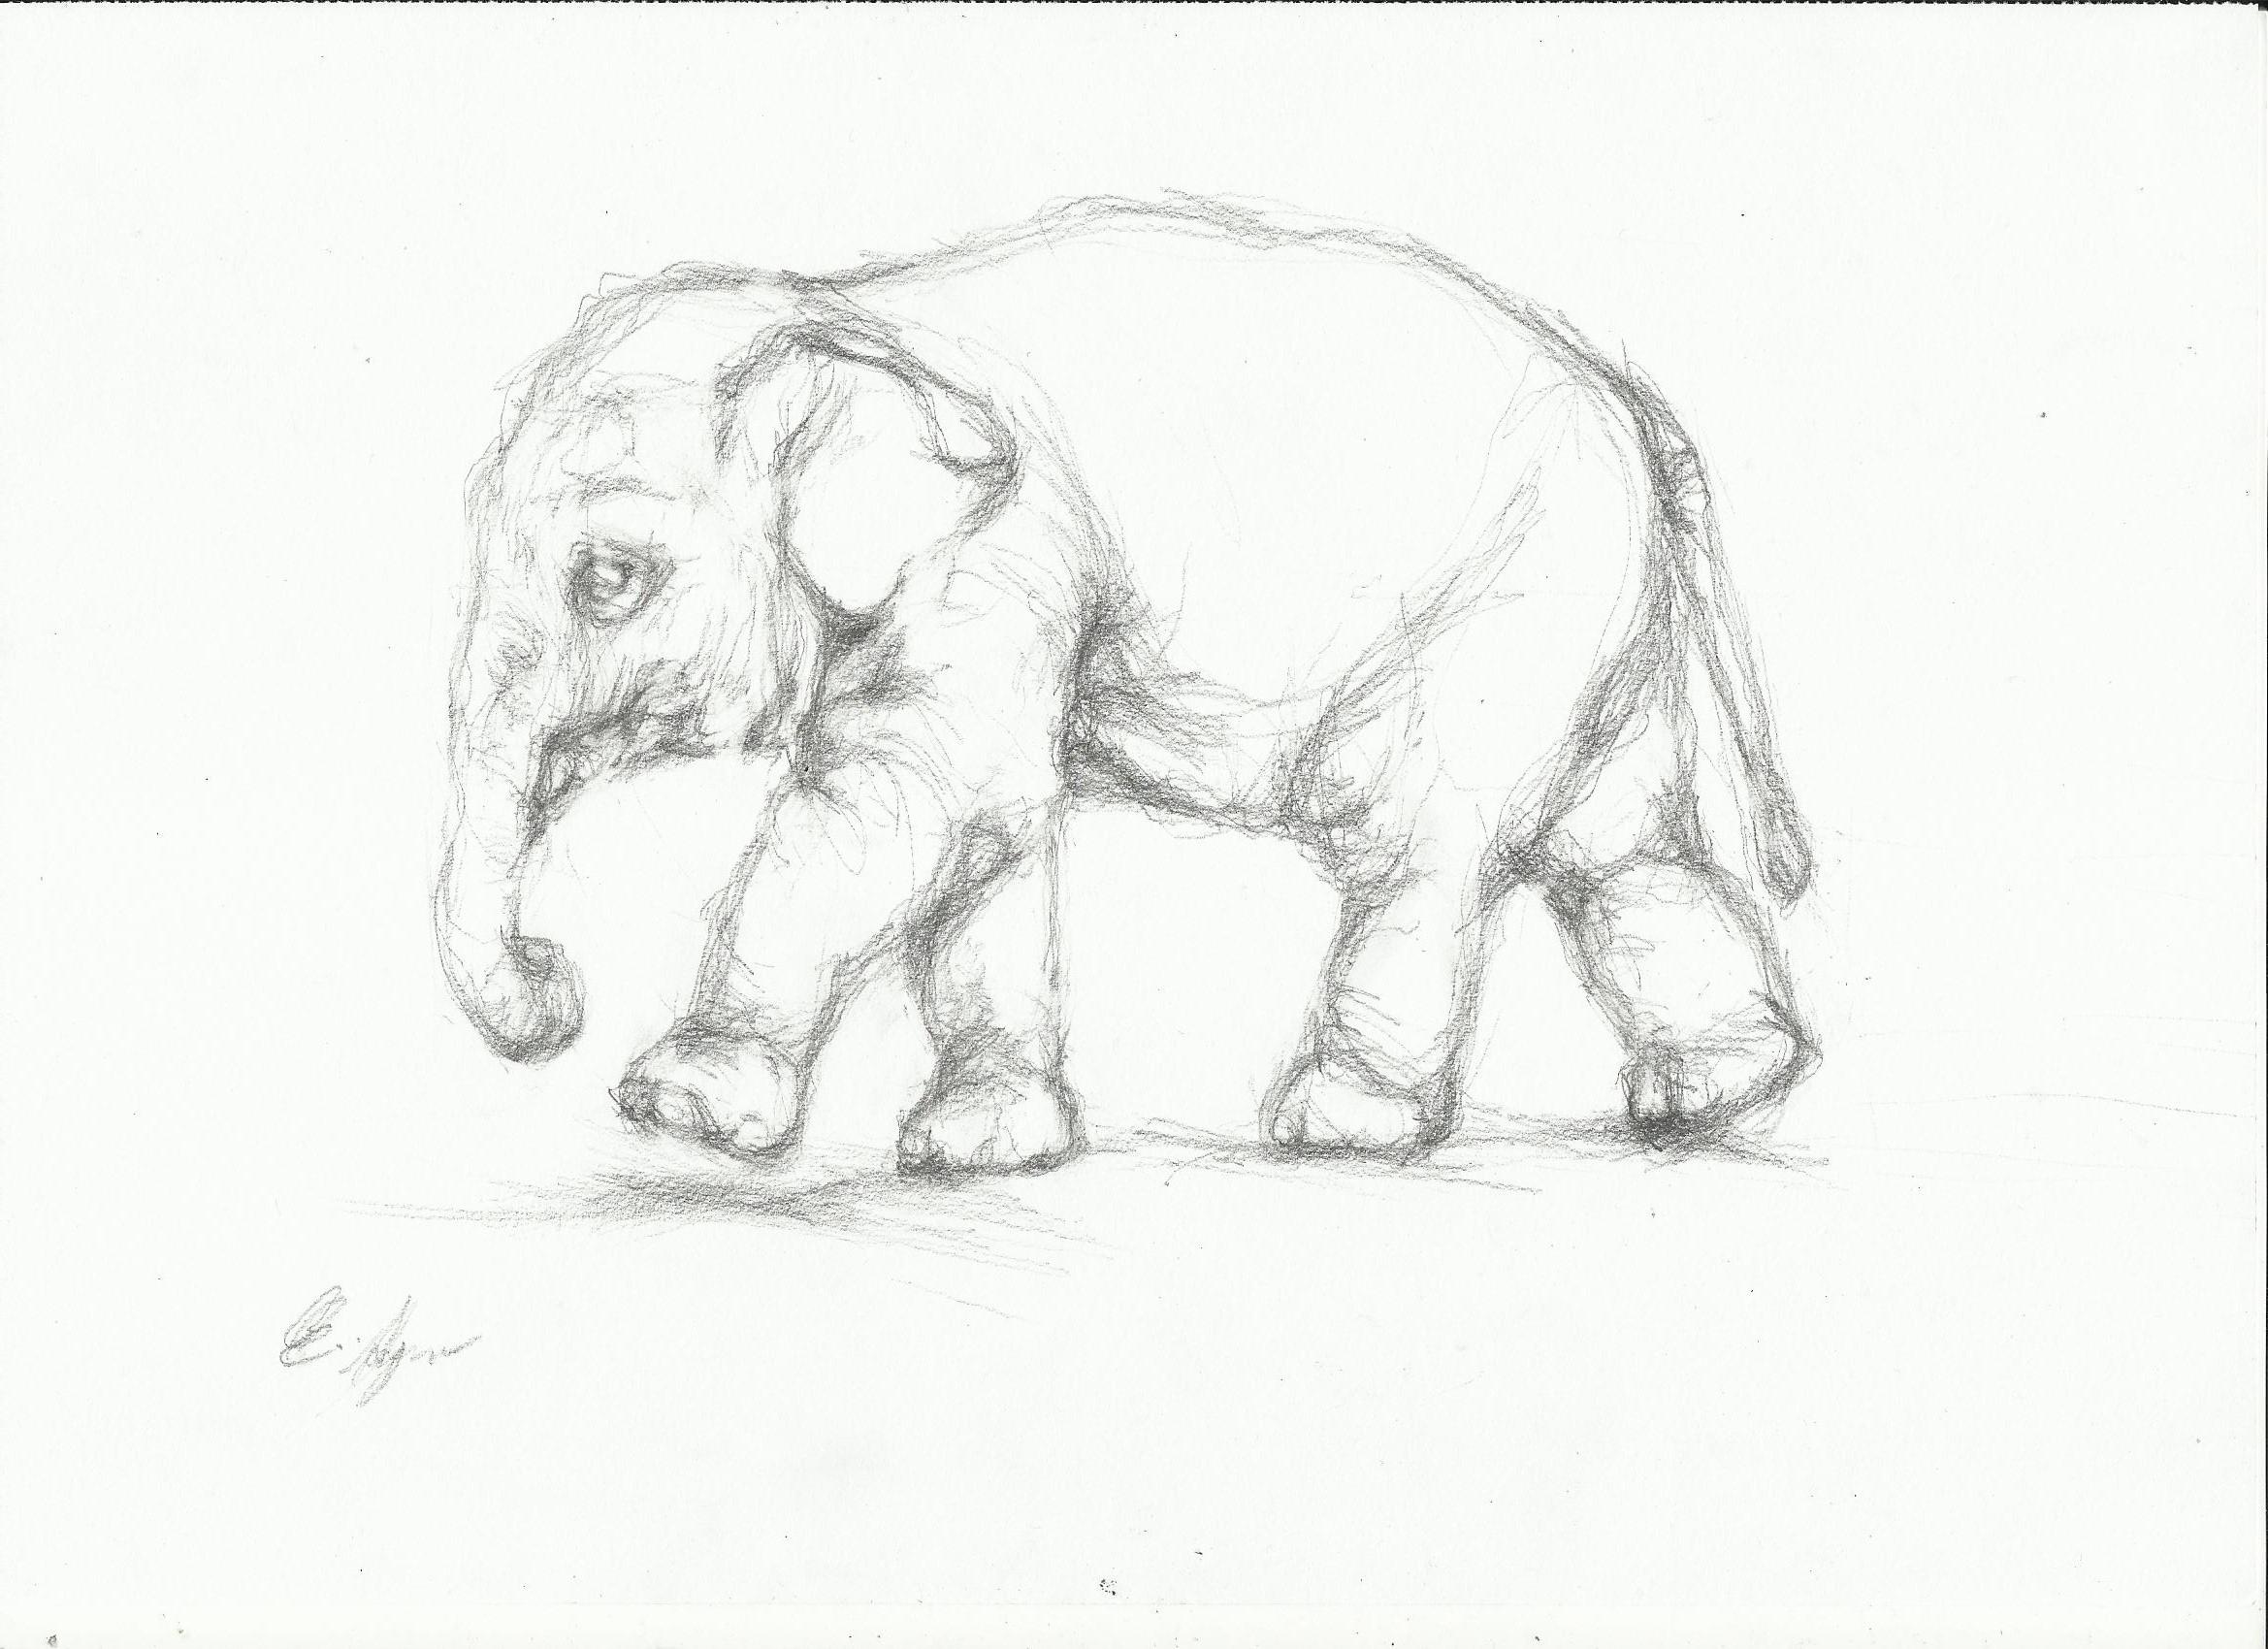 2338x1700 Animals Pencil Sketching Drawing Drawn Kitten Pencil Drawing